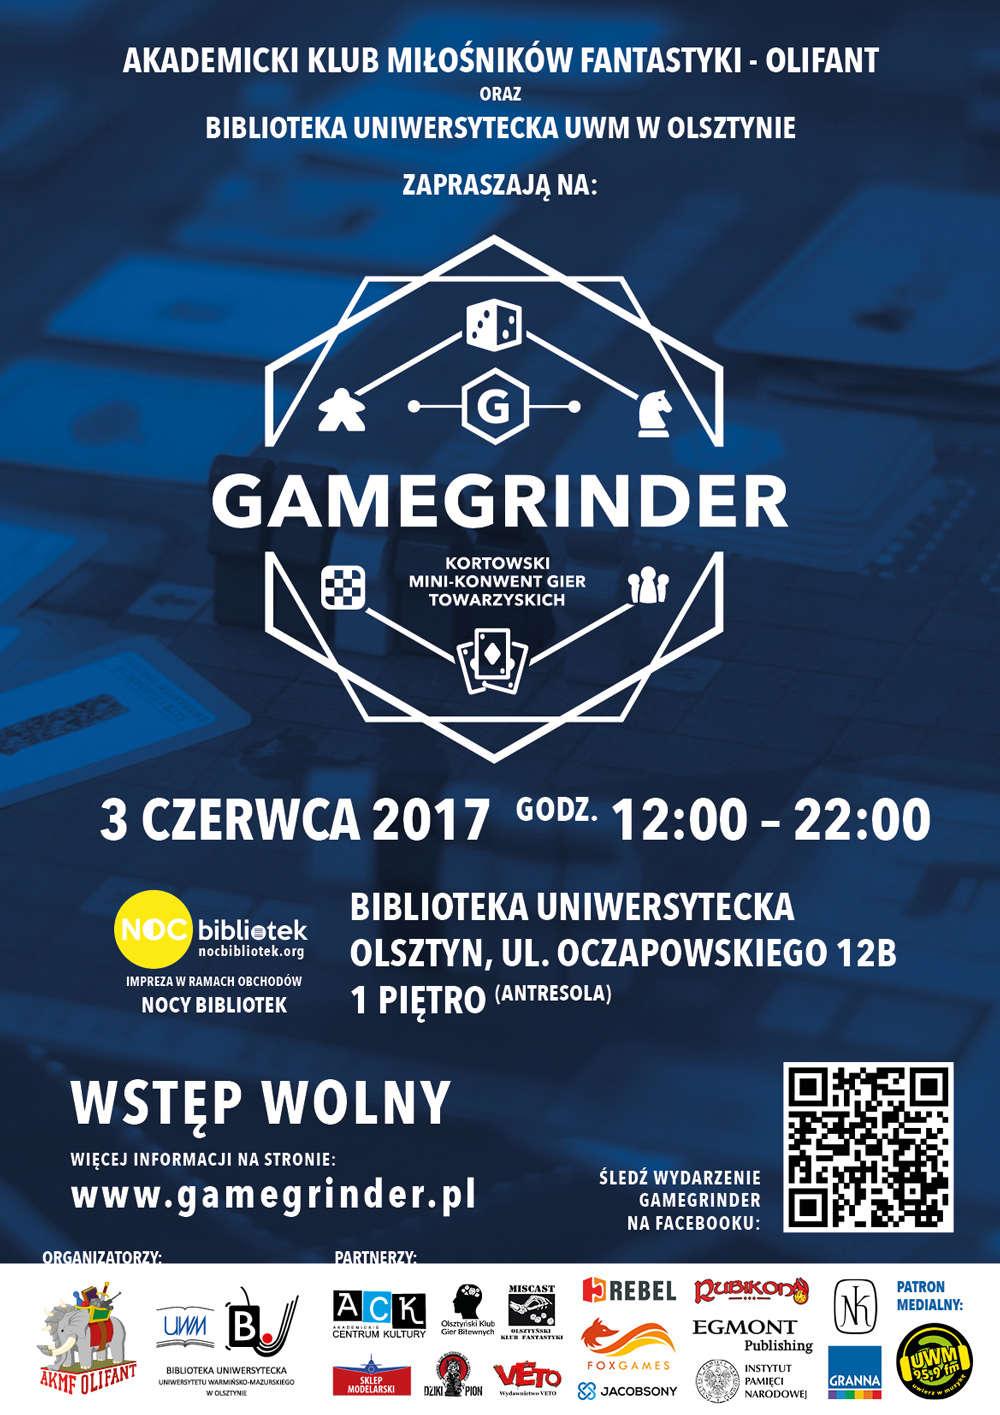 Kortowski Mini-konwent Gier Towarzyskich GAMEGRINDER - full image